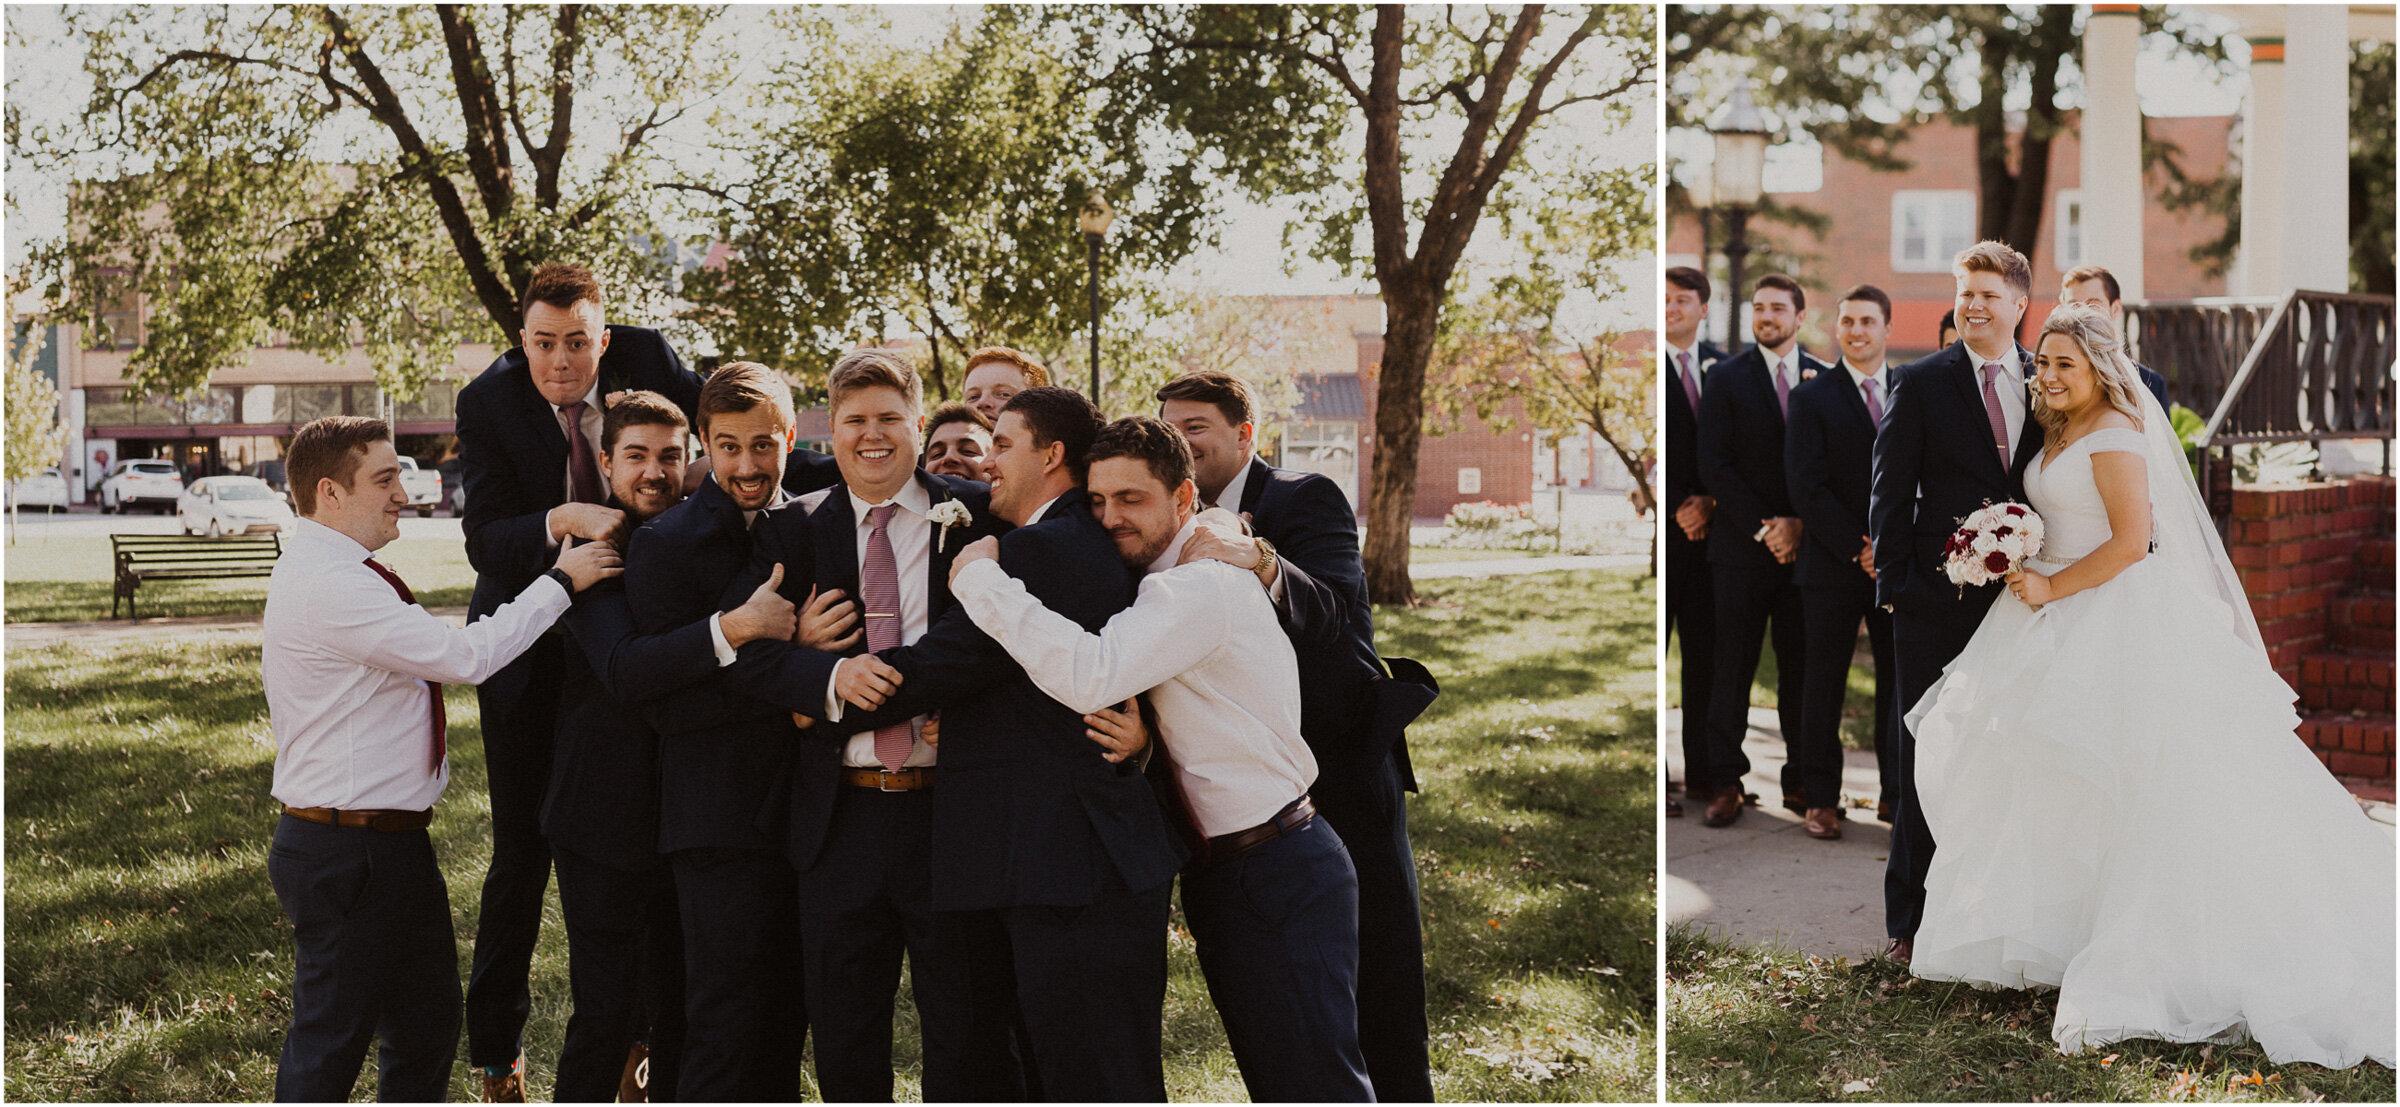 alyssa barletter photography town square paola wedding-14.jpg